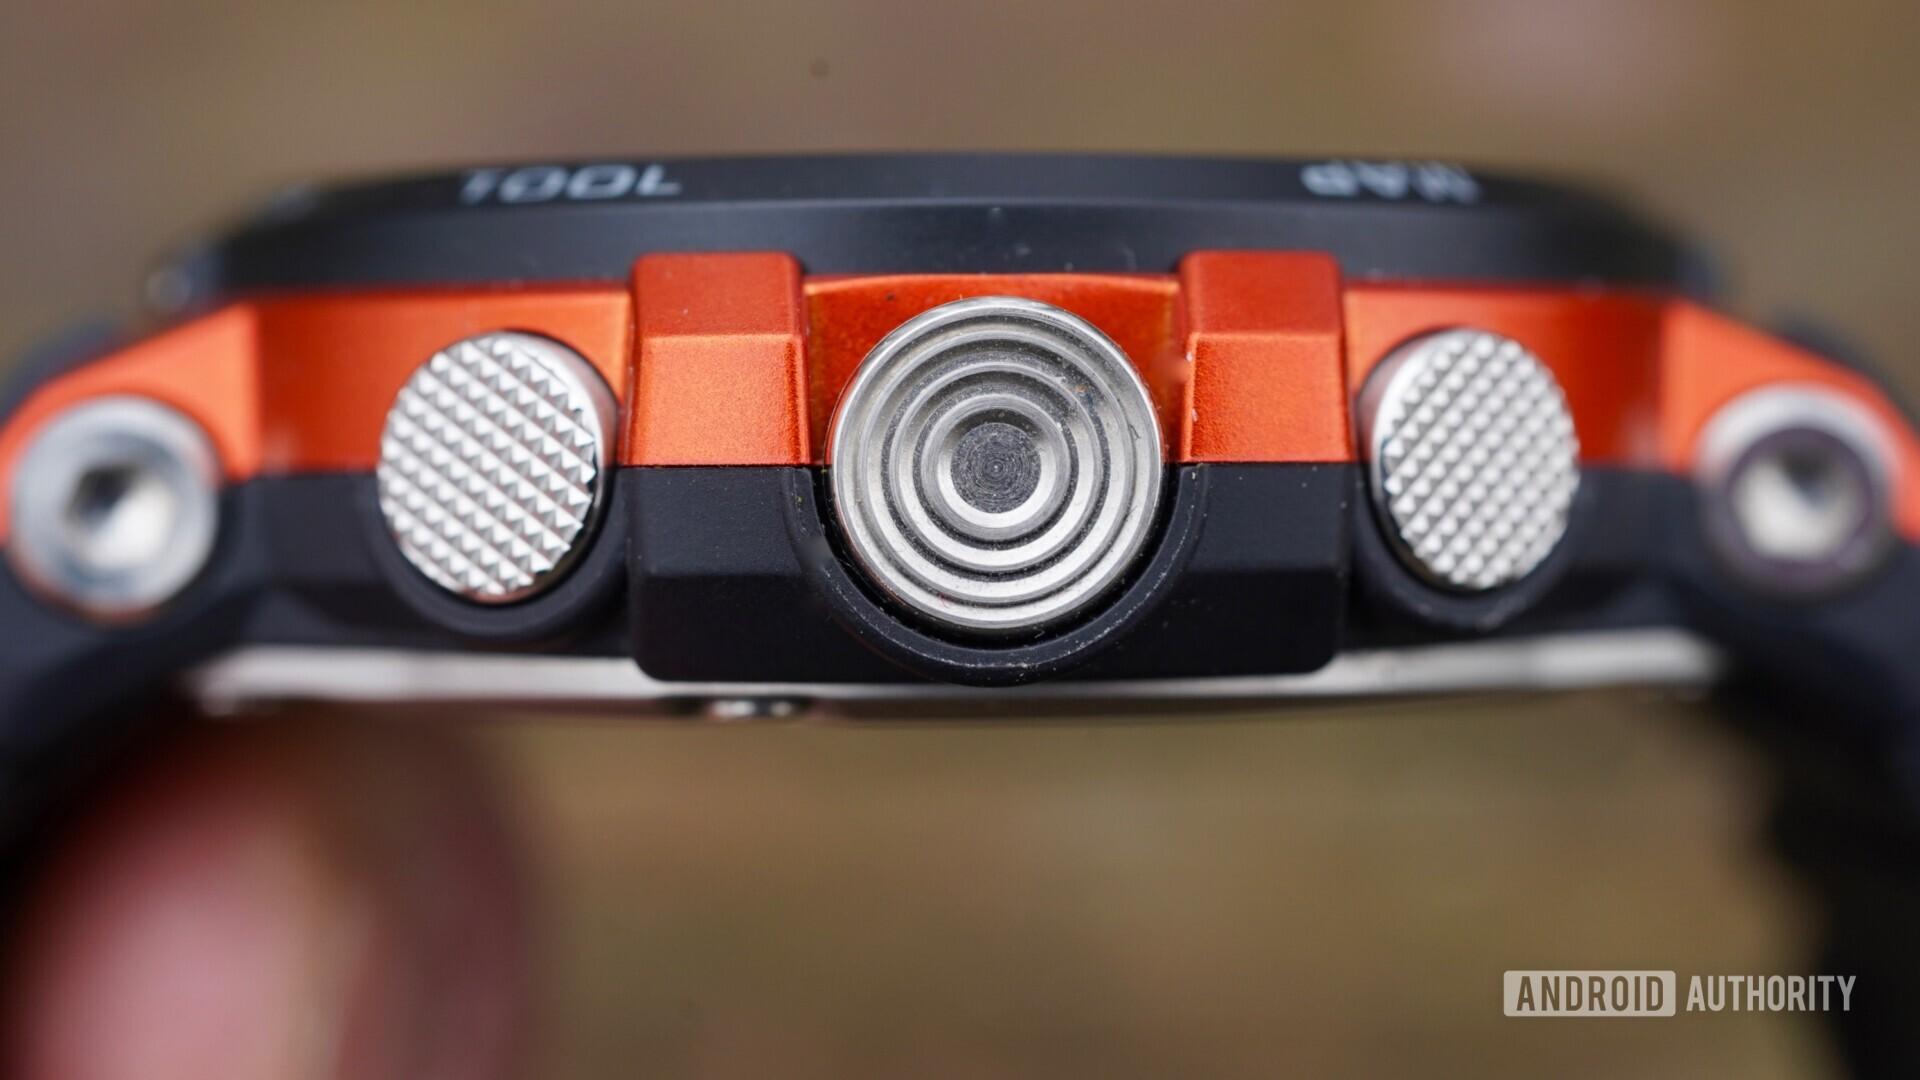 Casio Pro Trek WSD-F30 buttons closeup